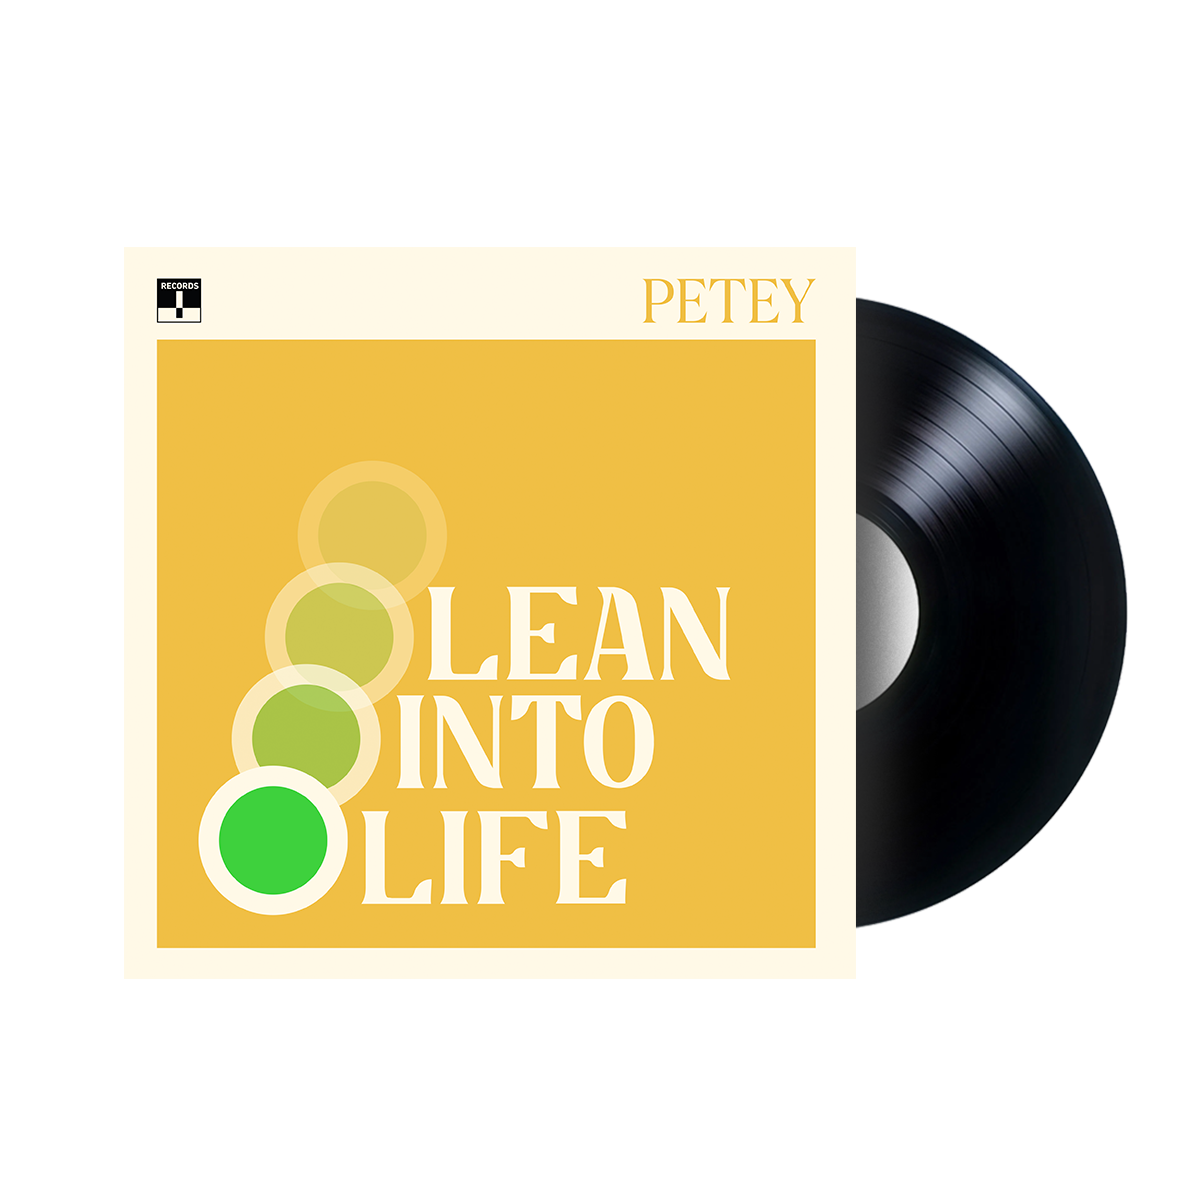 Petey - Lean into Life